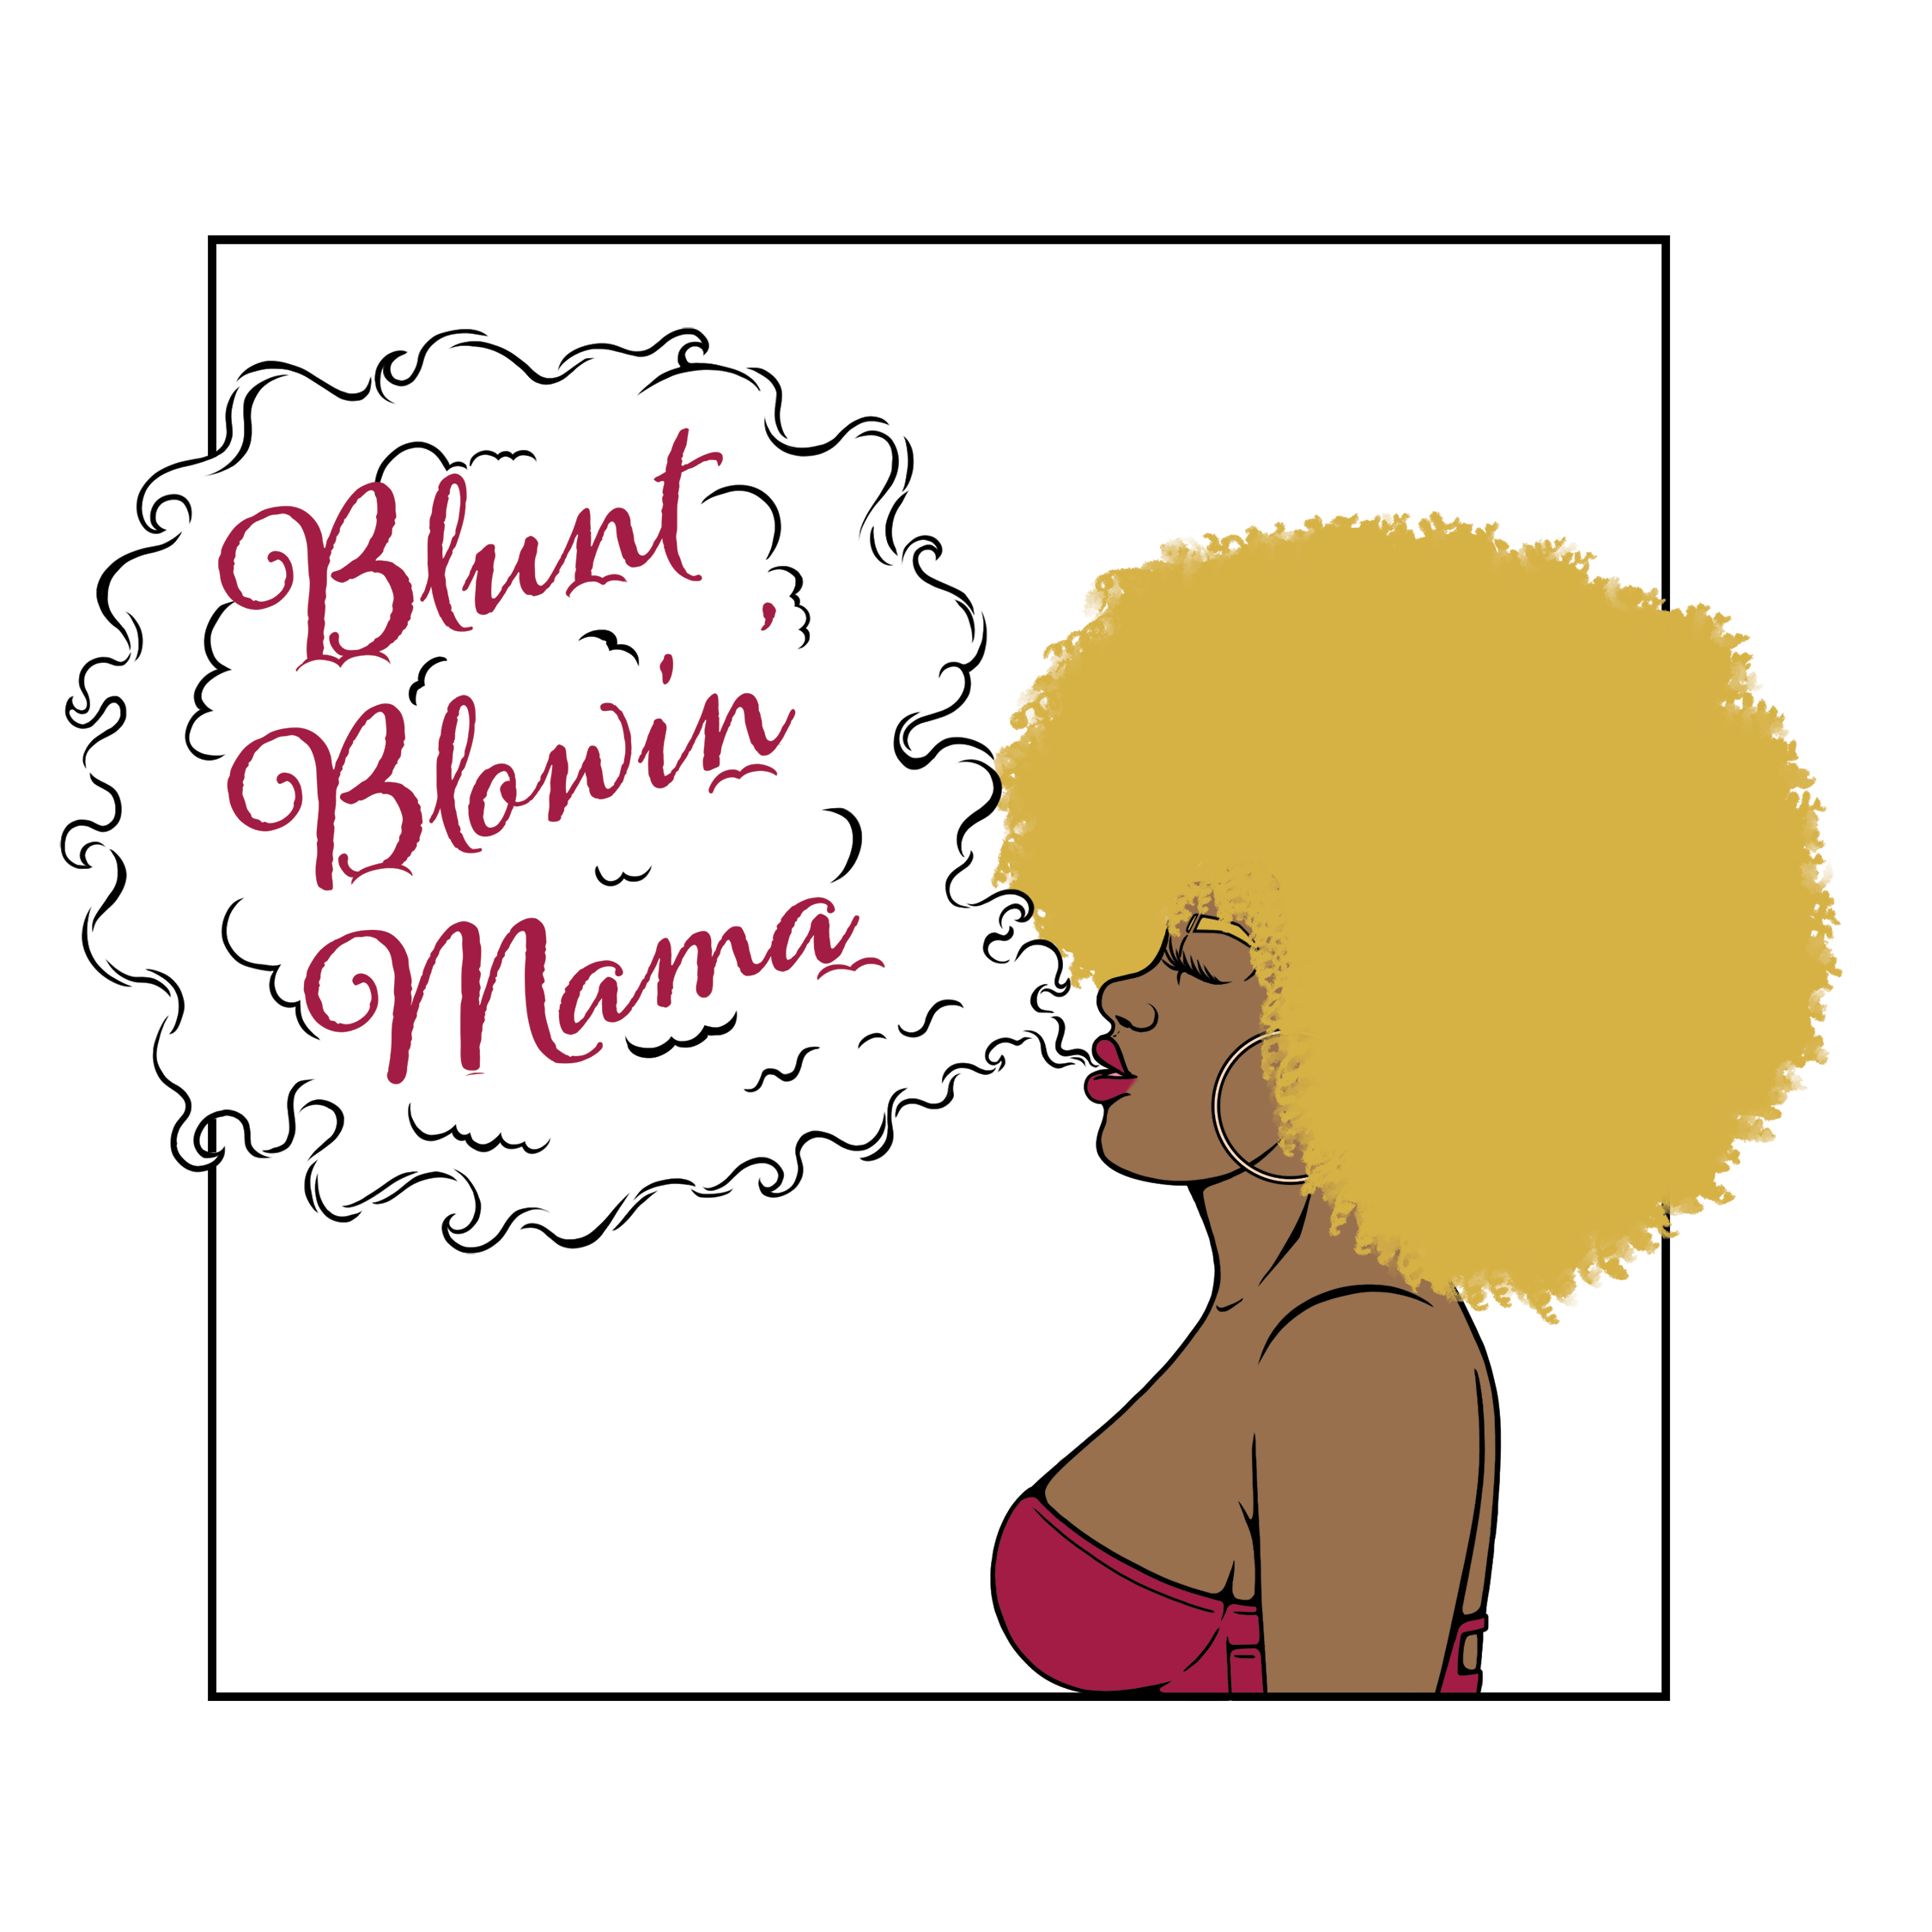 Blunt Blowin' Mama - Apple Podcast